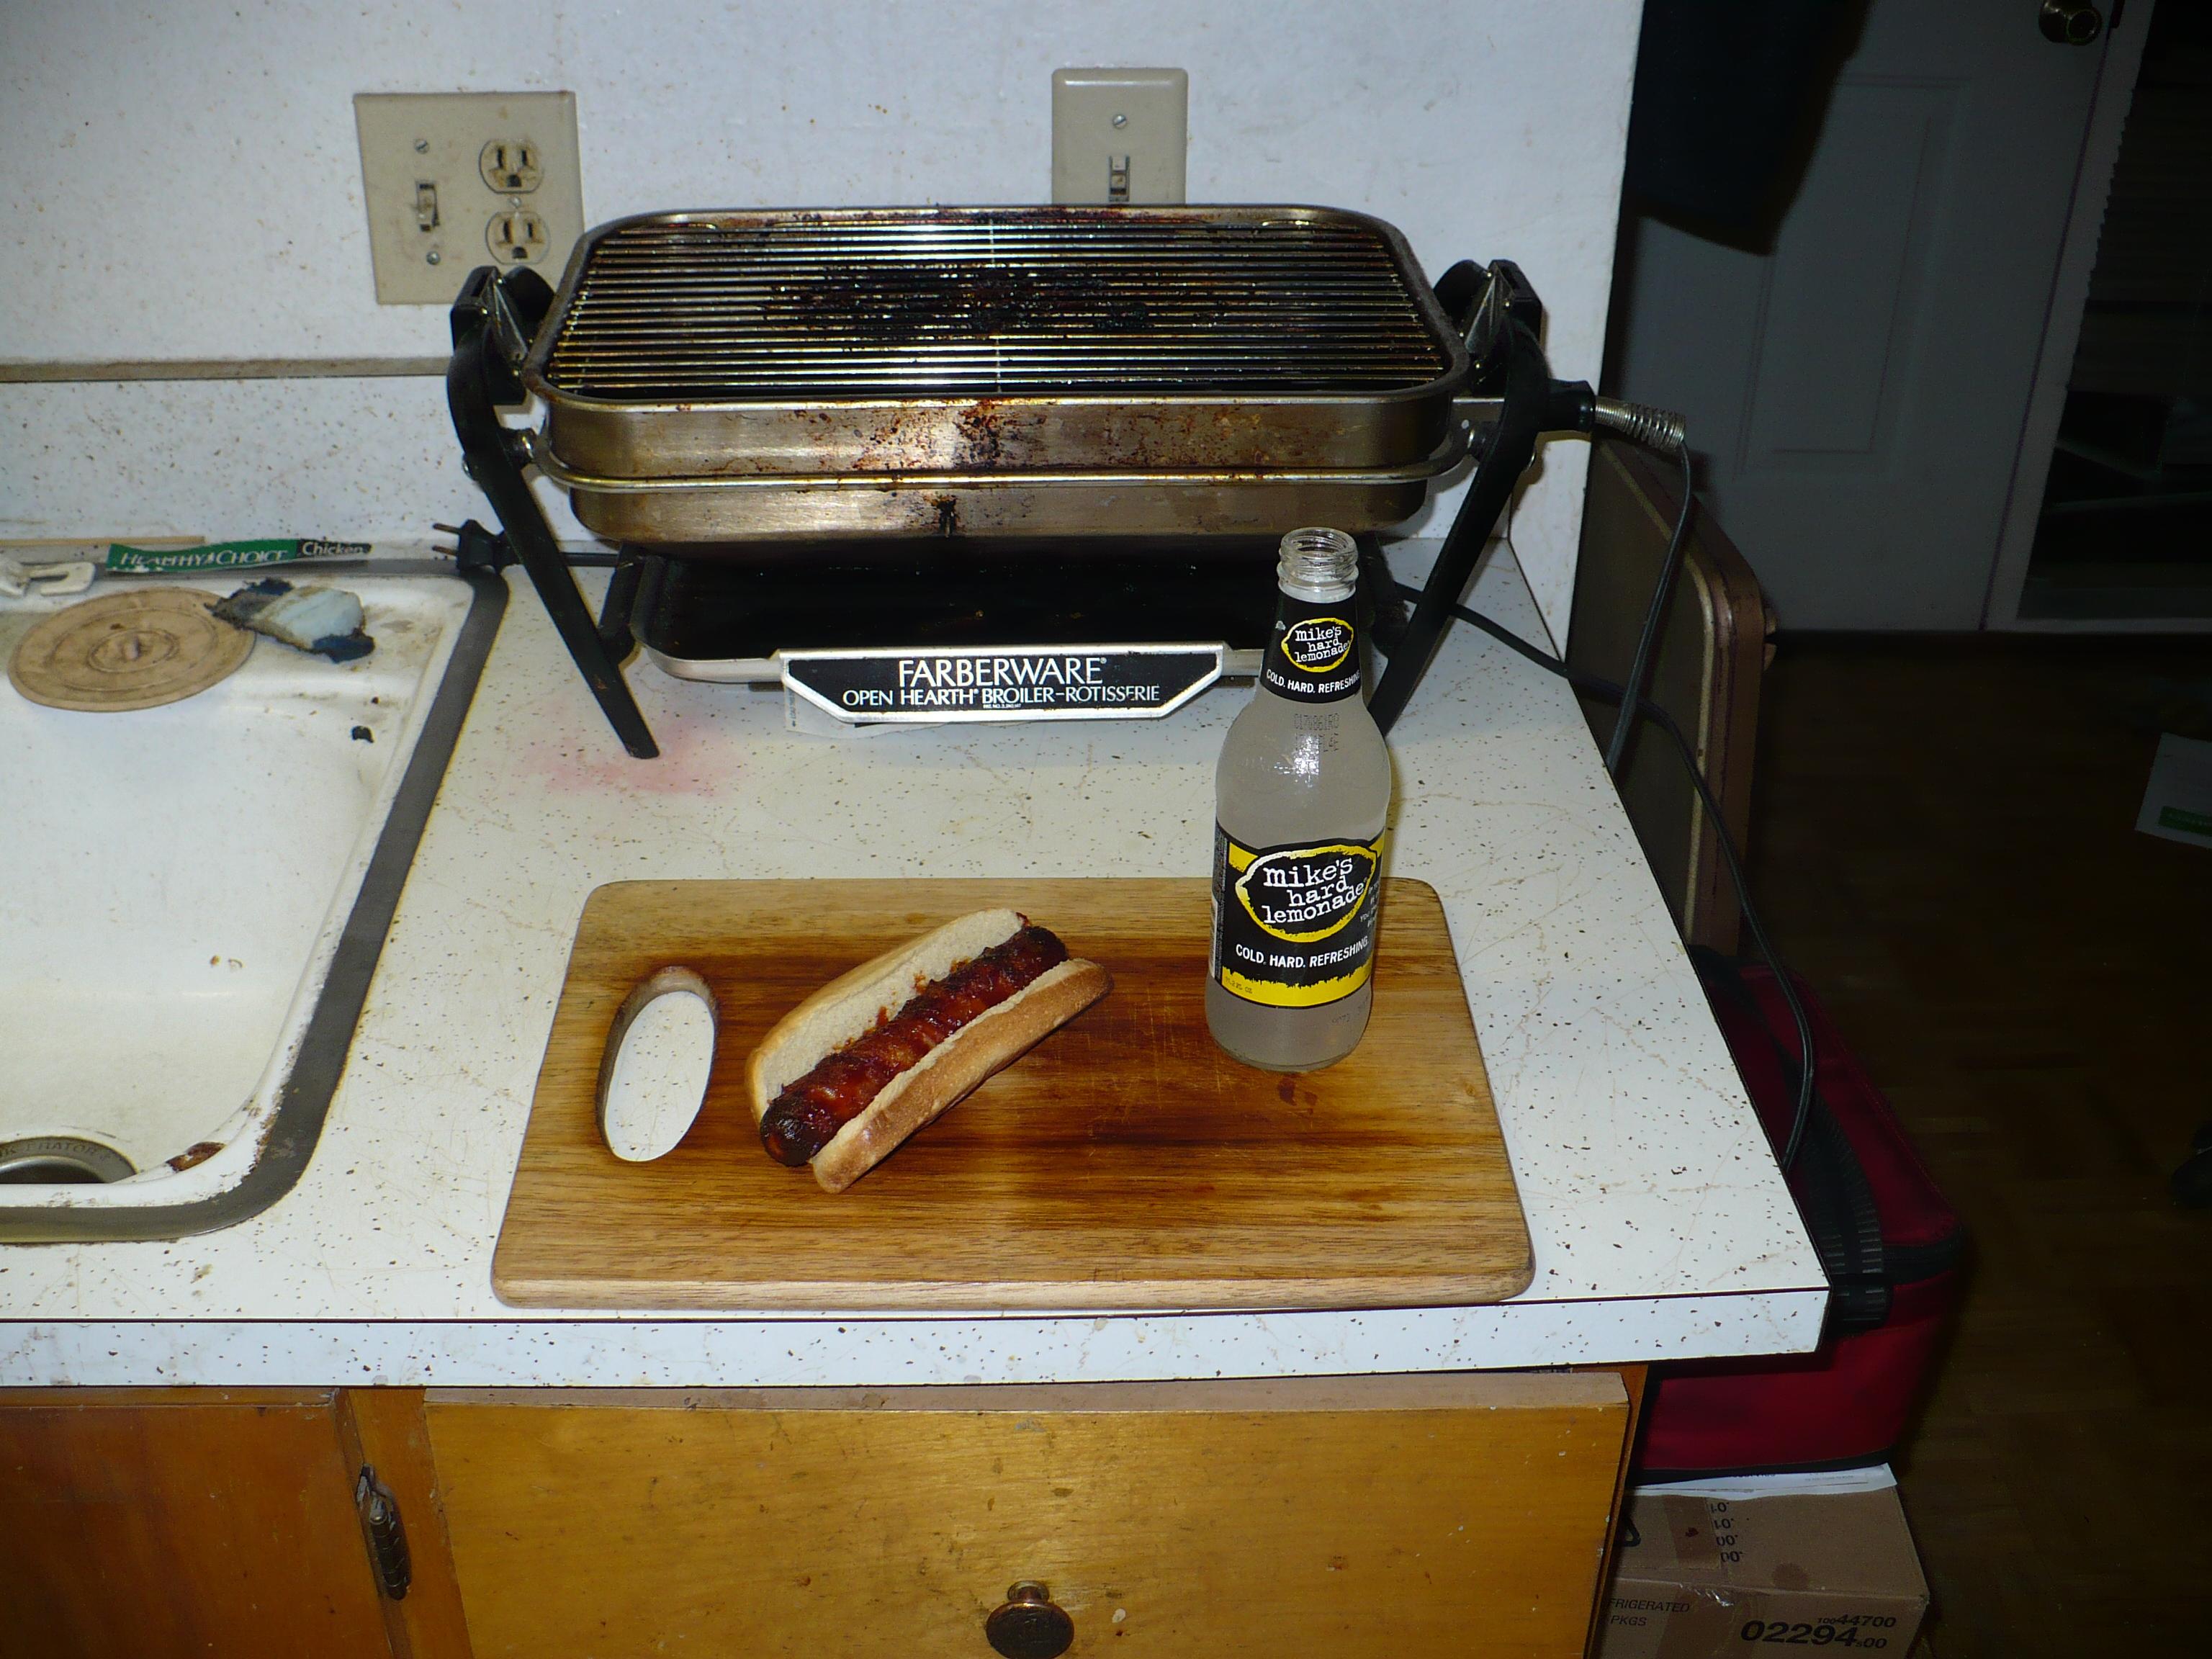 Sonoran Hotdogs   AKA Bacon Dogs